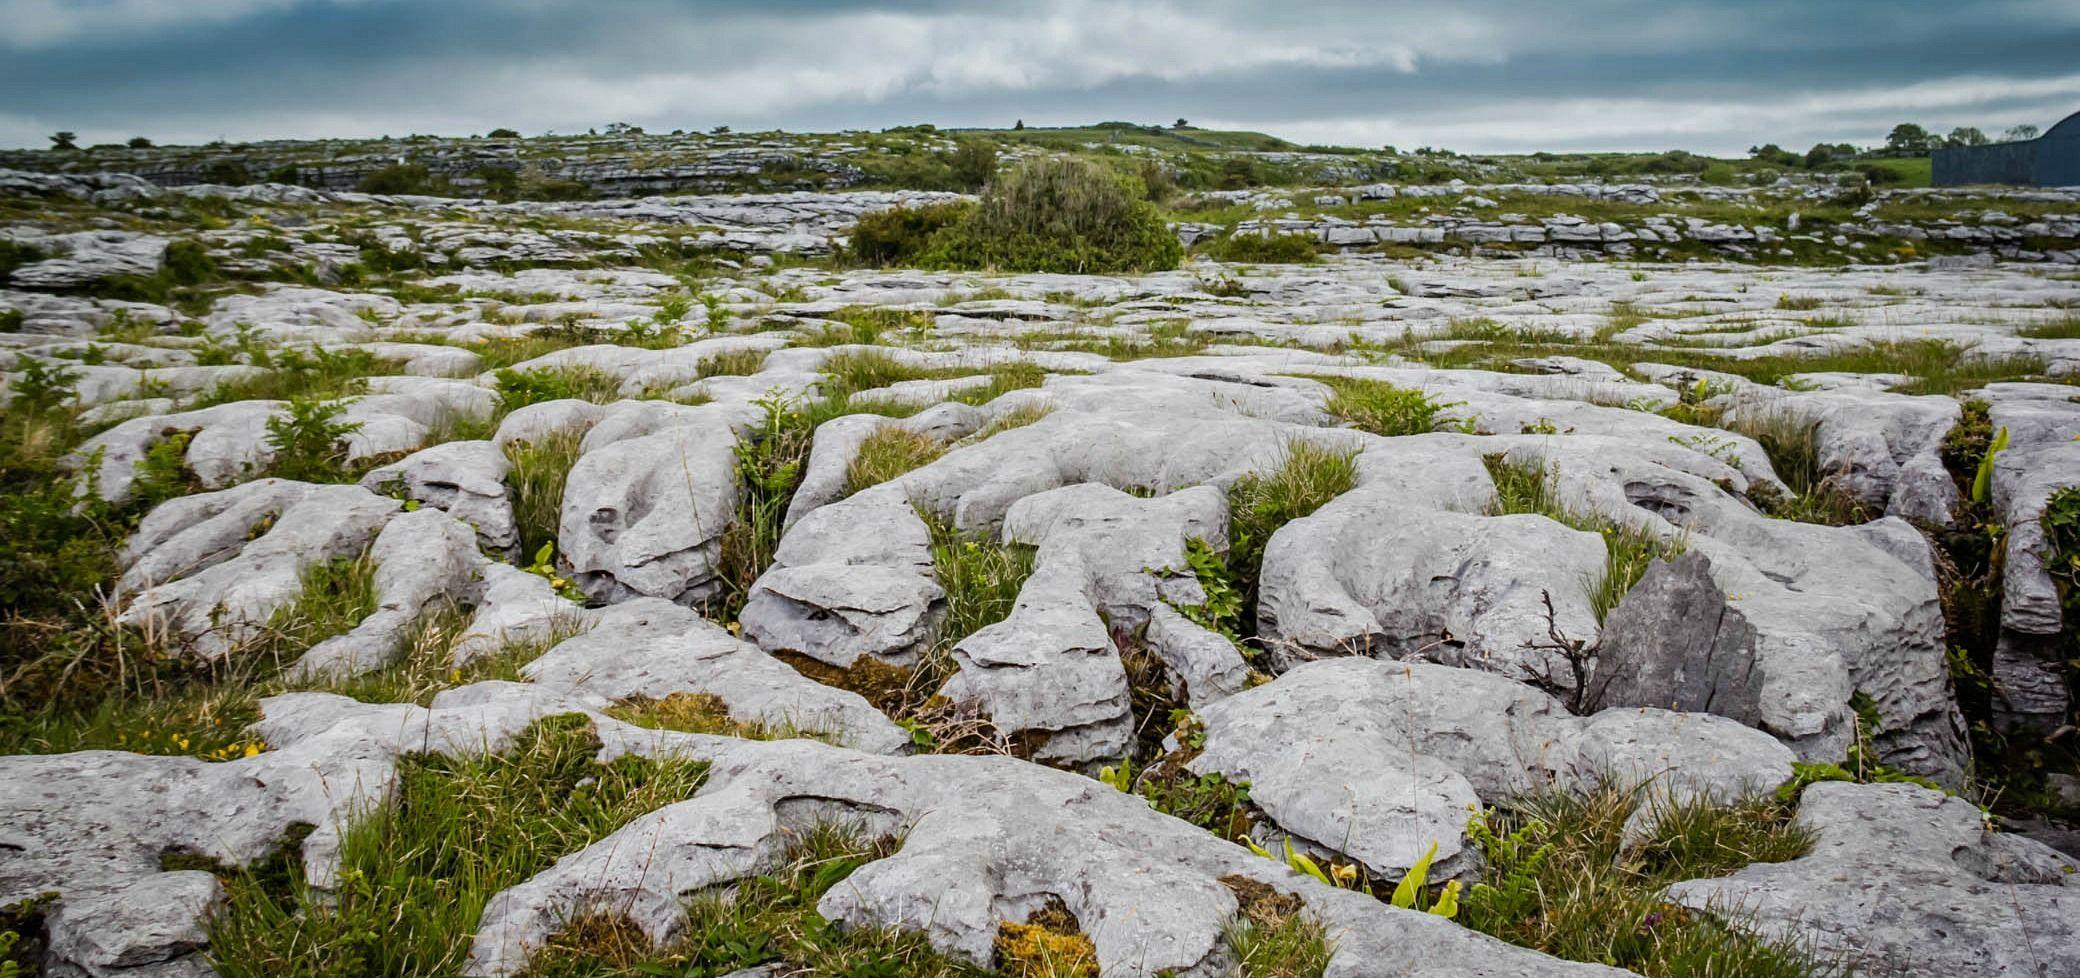 Ireland Travel Guide |Divergent Travelers